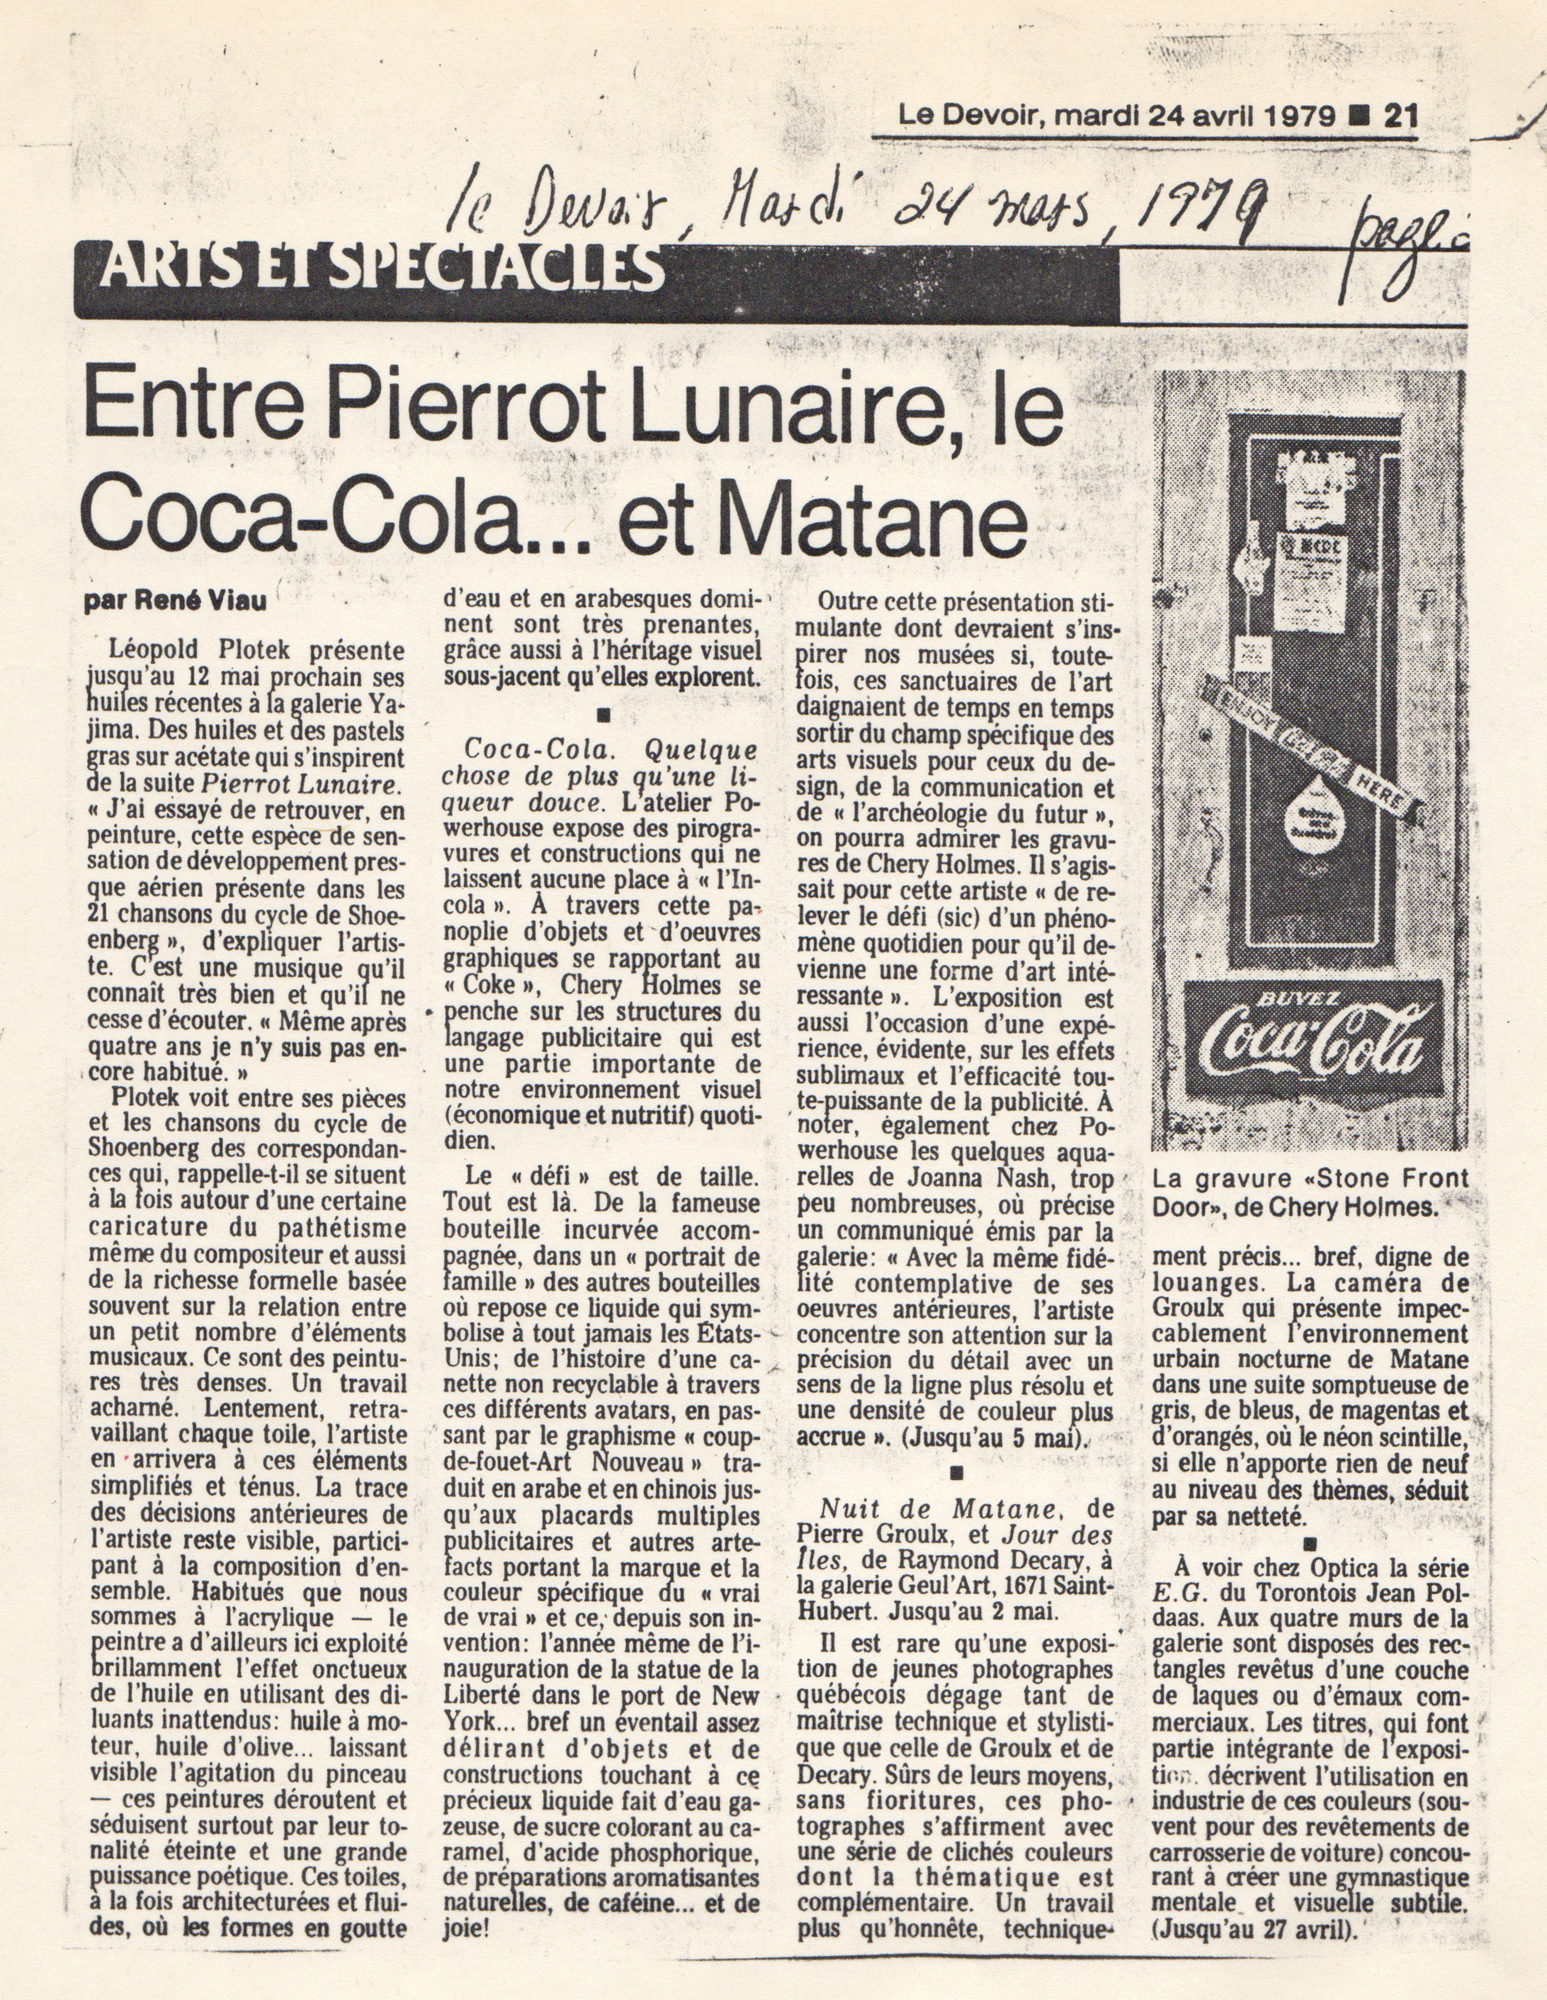 Le Devoir mardi 24 avril, 1979